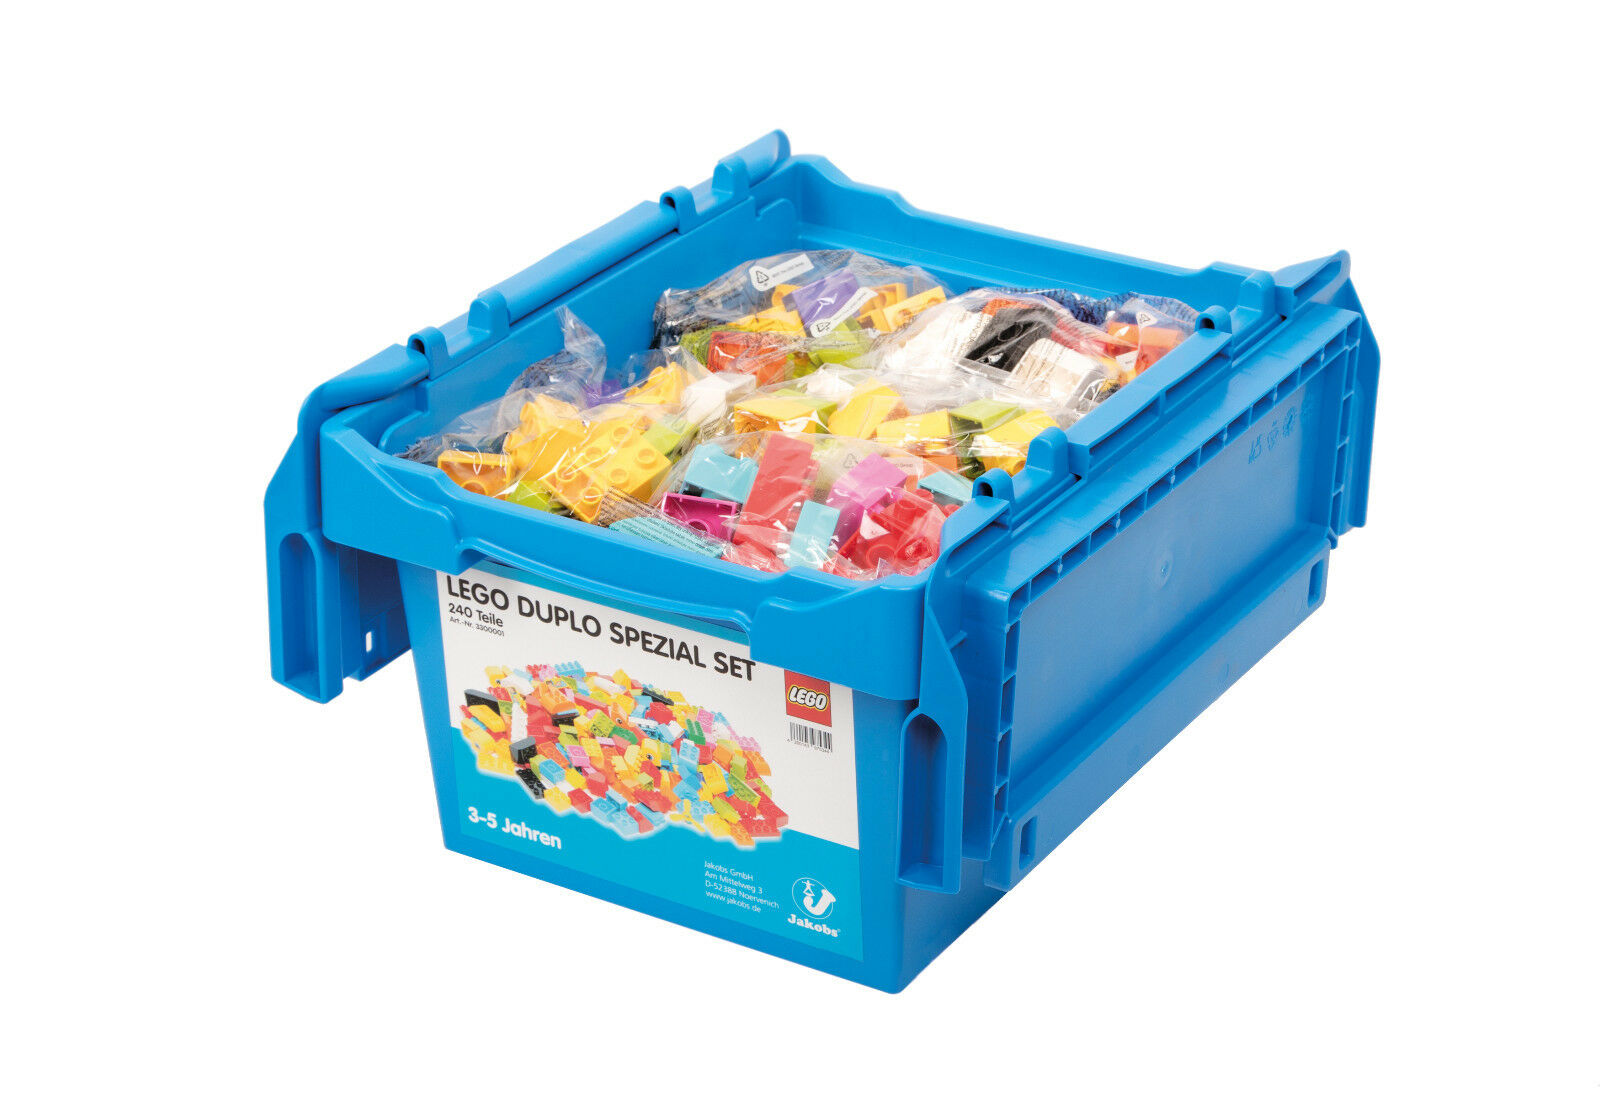 LEGO DUPLO PIETRE SPECIALE SET 240 tlg. in STABILE Kunststoffbox formazione